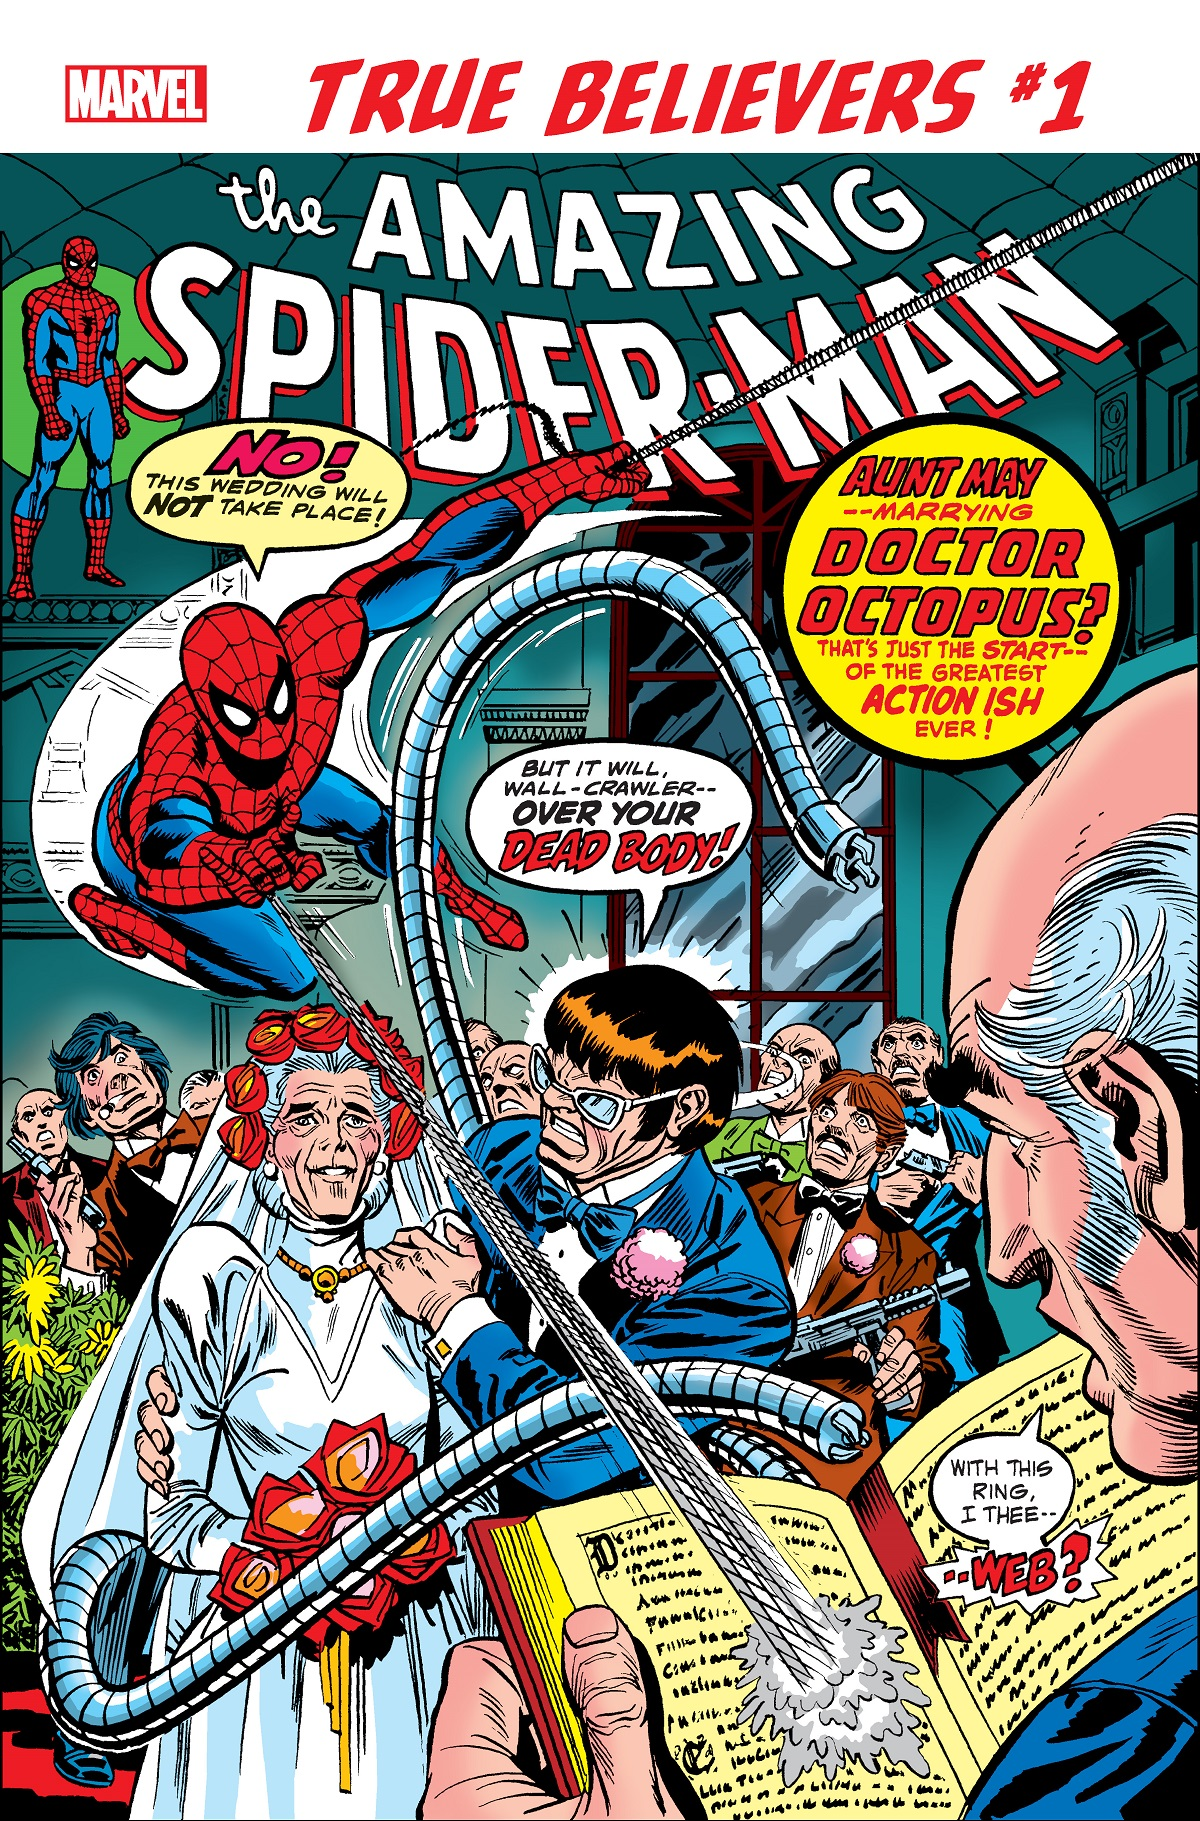 True Believers: Spider-Man - The Wedding of Aunt May & Doc Ock Vol 1 1 | Marvel Database | Fandom